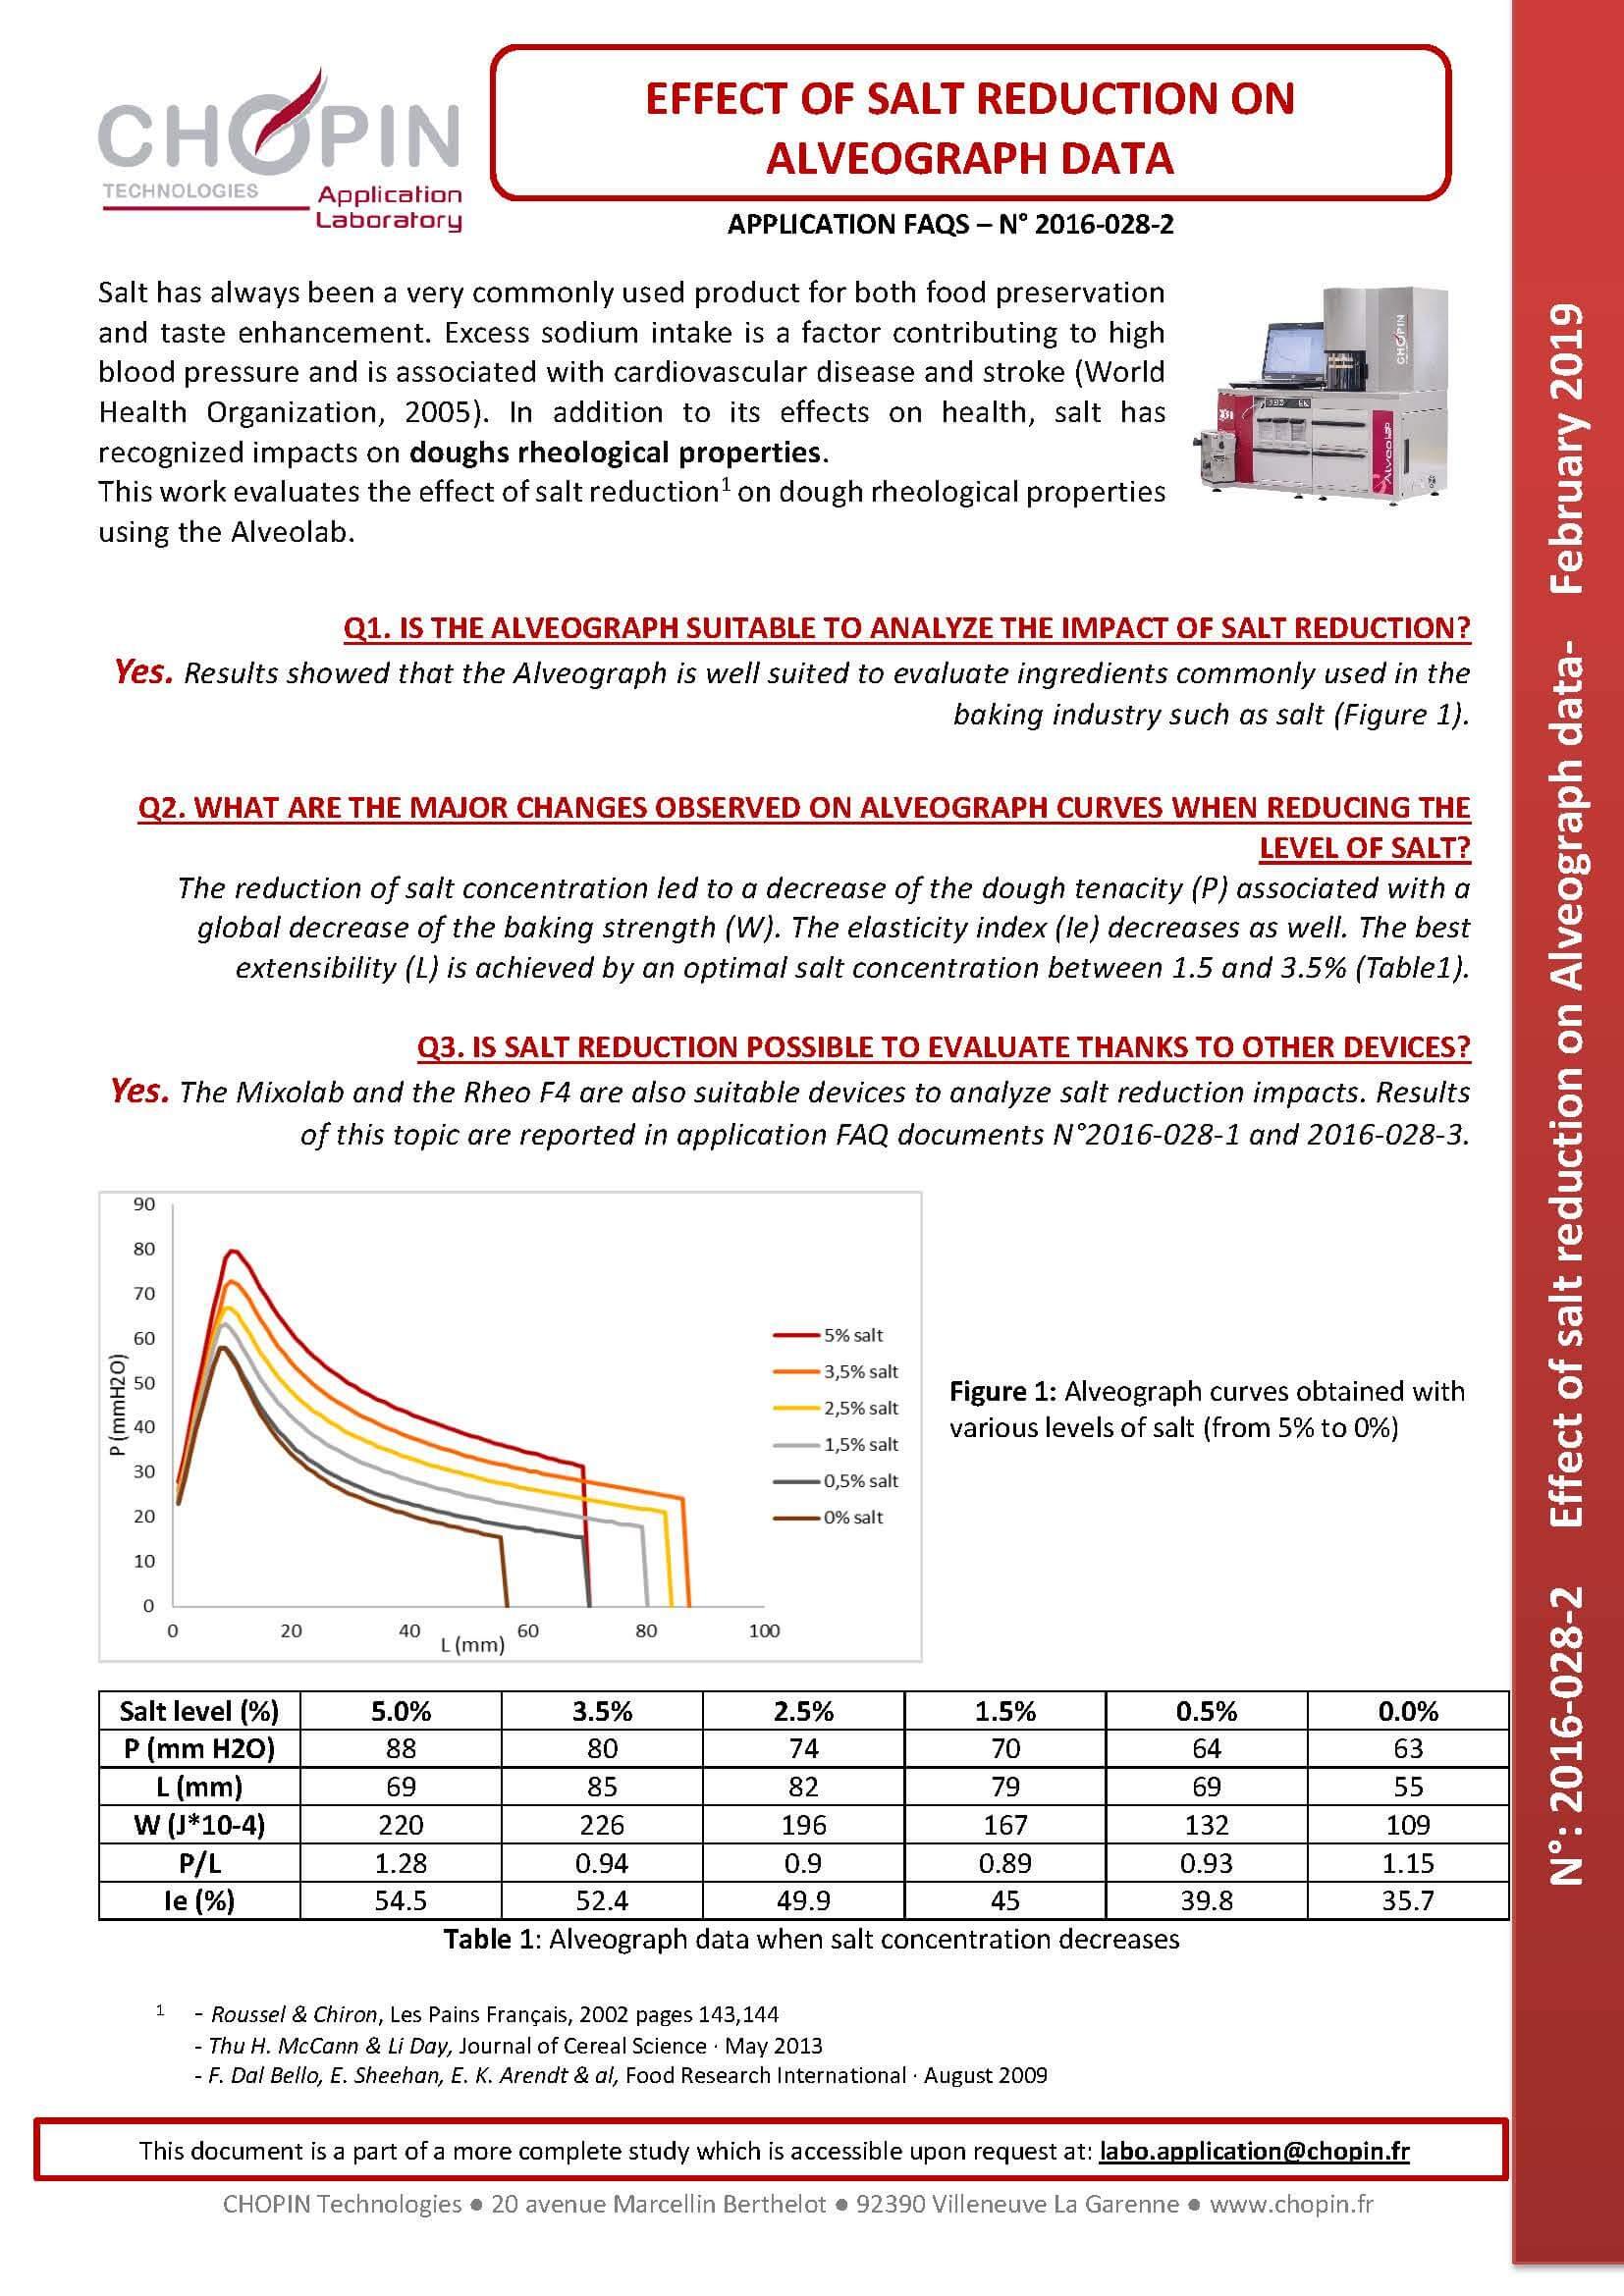 Effect of Salt Reduction on Alveograph Data